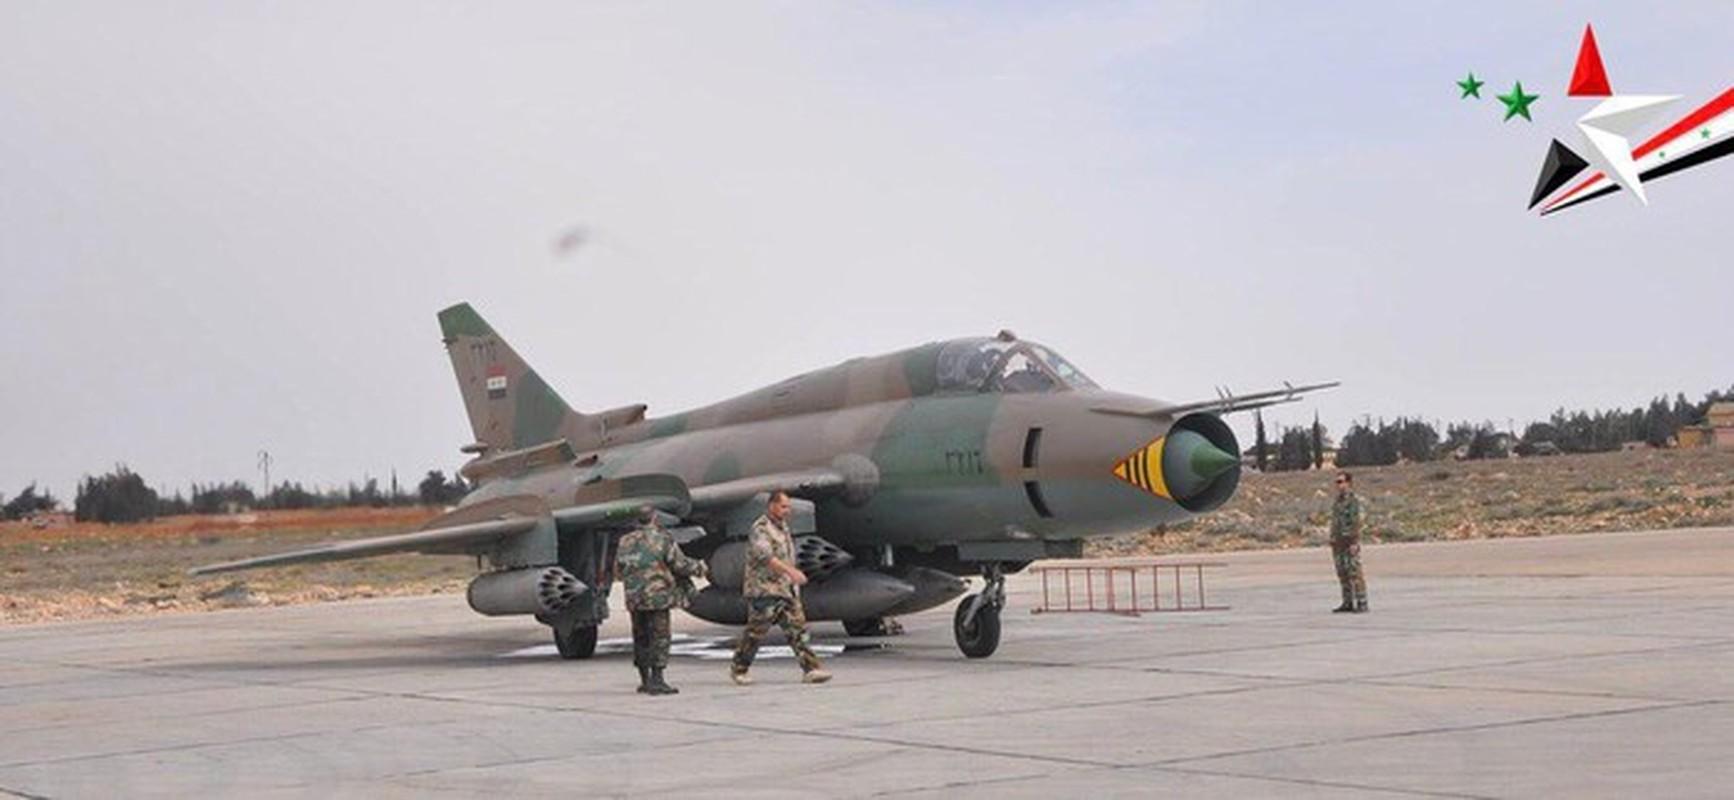 Toan canh vu Su-22 Syria bi phong khong Israel ban ha moi nhat-Hinh-8